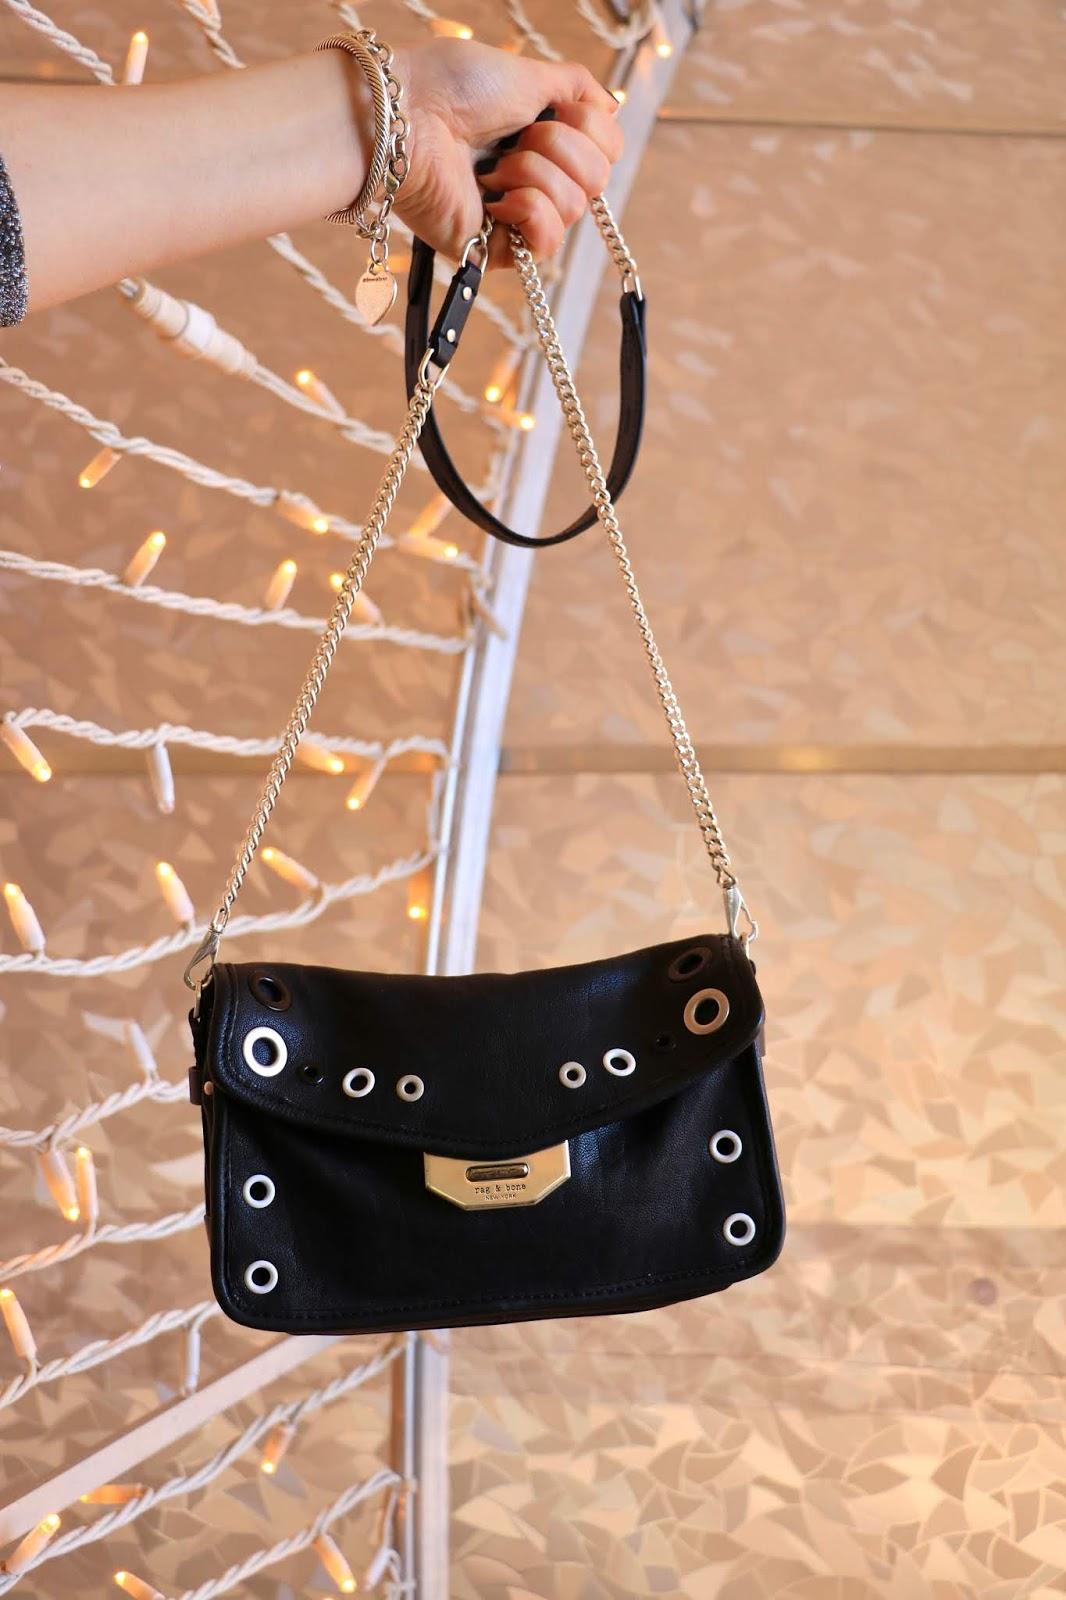 Nyc fashion blogger Kathleen Harper's Rag & Bone leather purse.